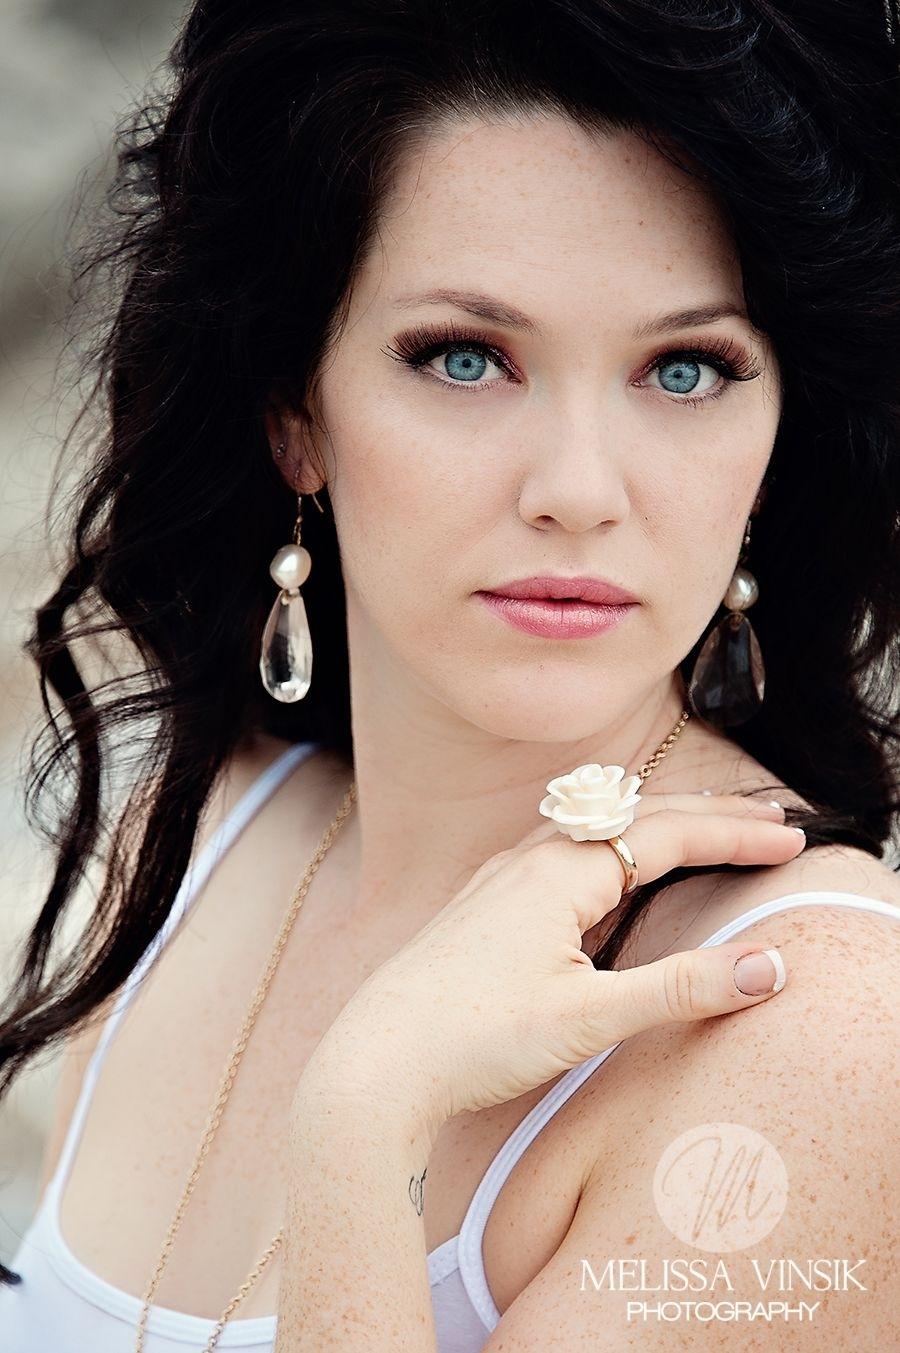 She Is Stunning. My Favourite Look, Fair Skin Dark Hair Blue Eyes for Makeup For Blue Eyes Pale Skin Dark Hair